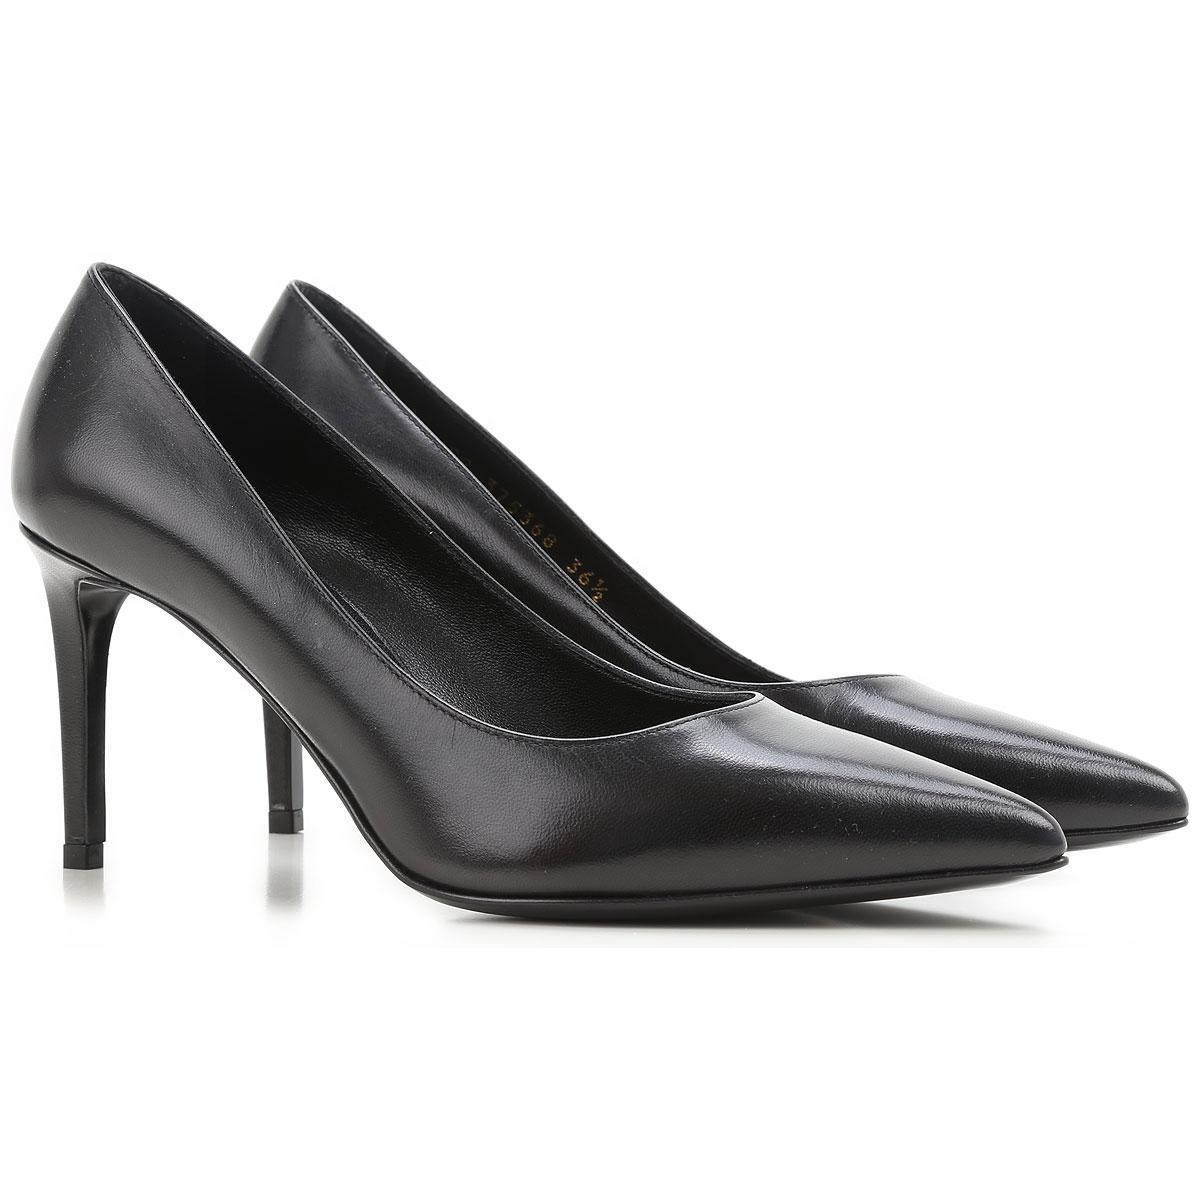 chaussures femme yves saint laurent code produit 375368 akp00 1000. Black Bedroom Furniture Sets. Home Design Ideas